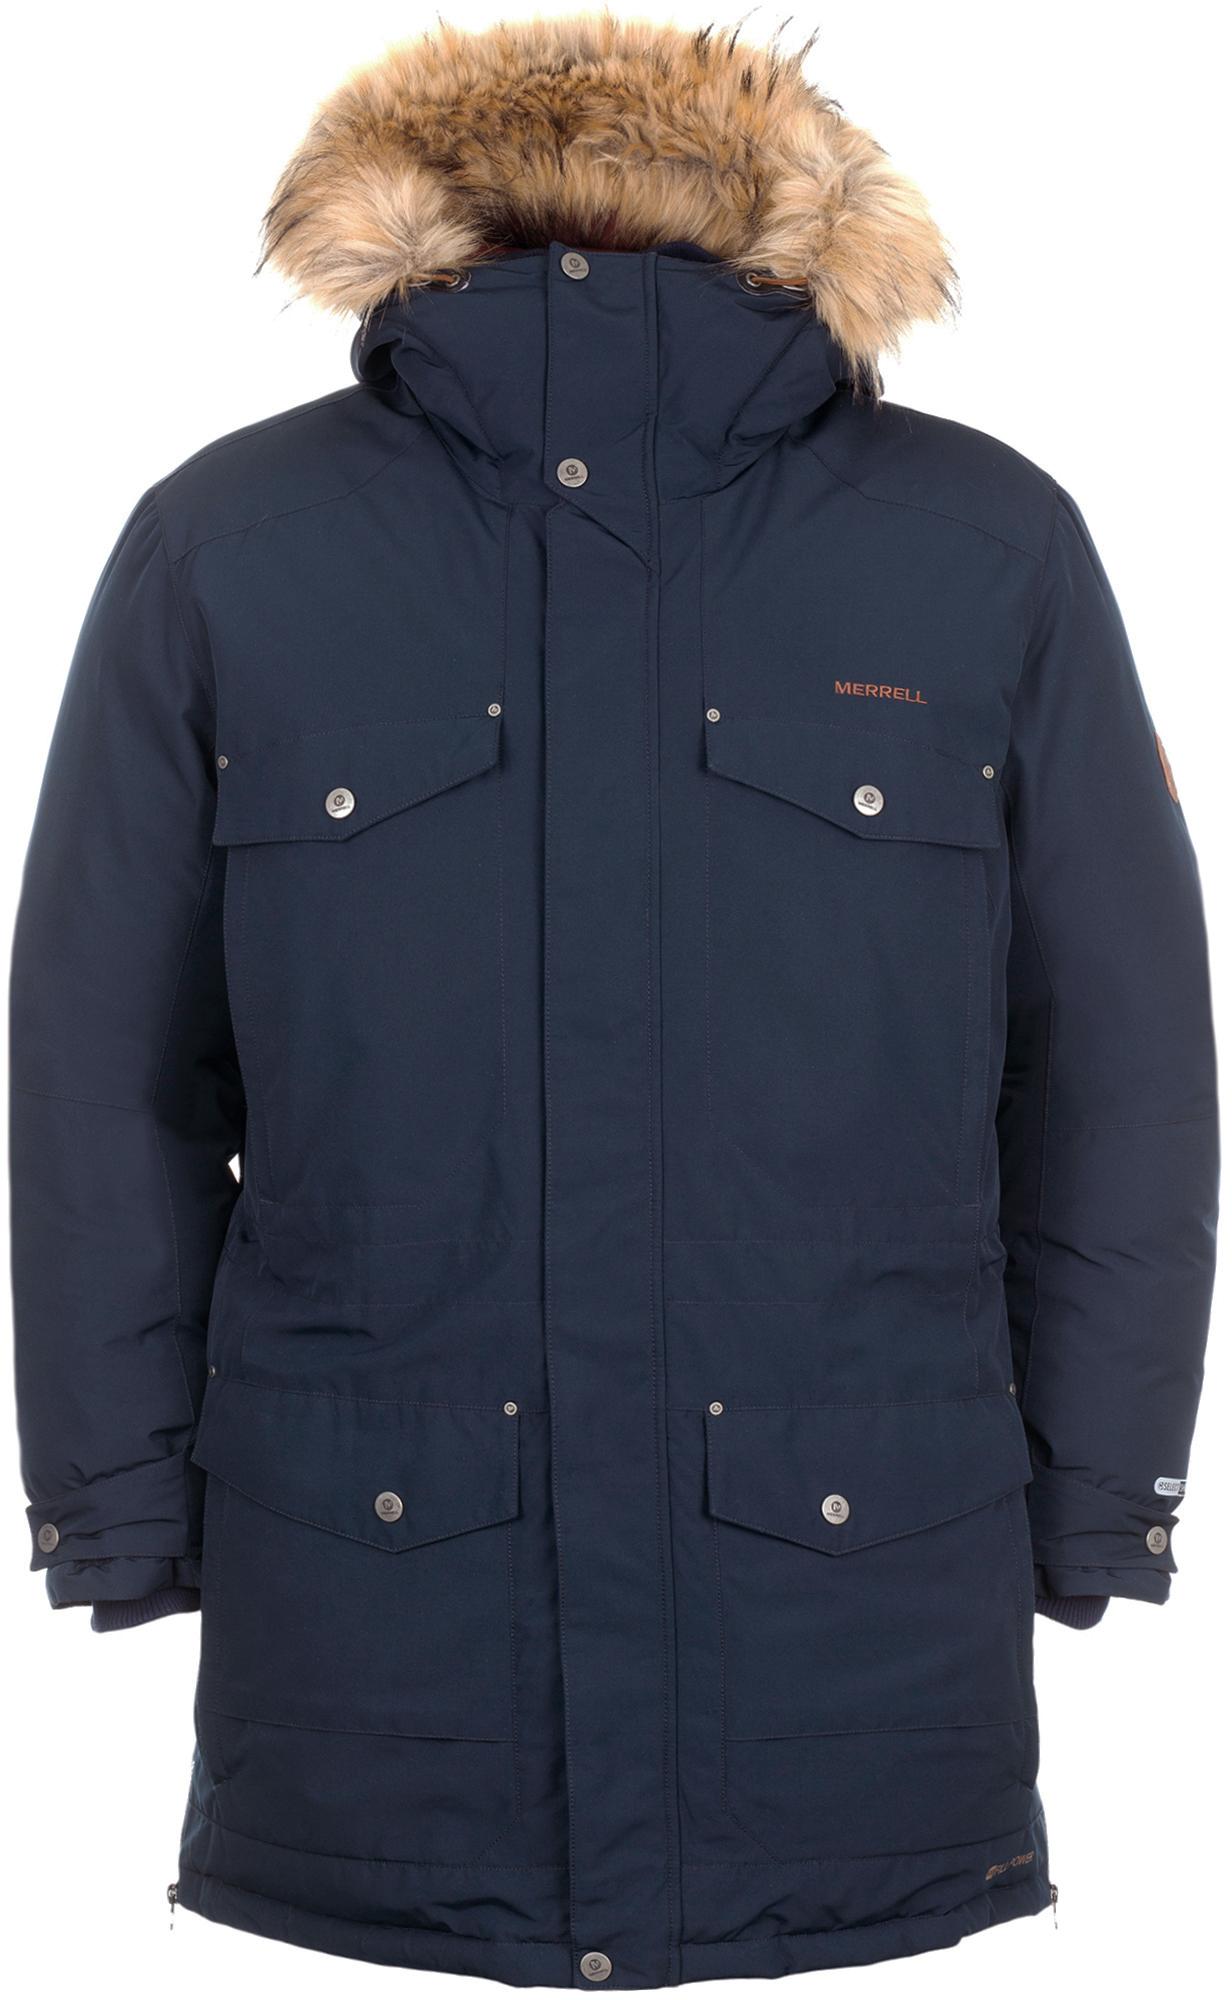 Merrell Куртка пуховая мужская Merrell Salamis merrell куртка утепленная женская merrell